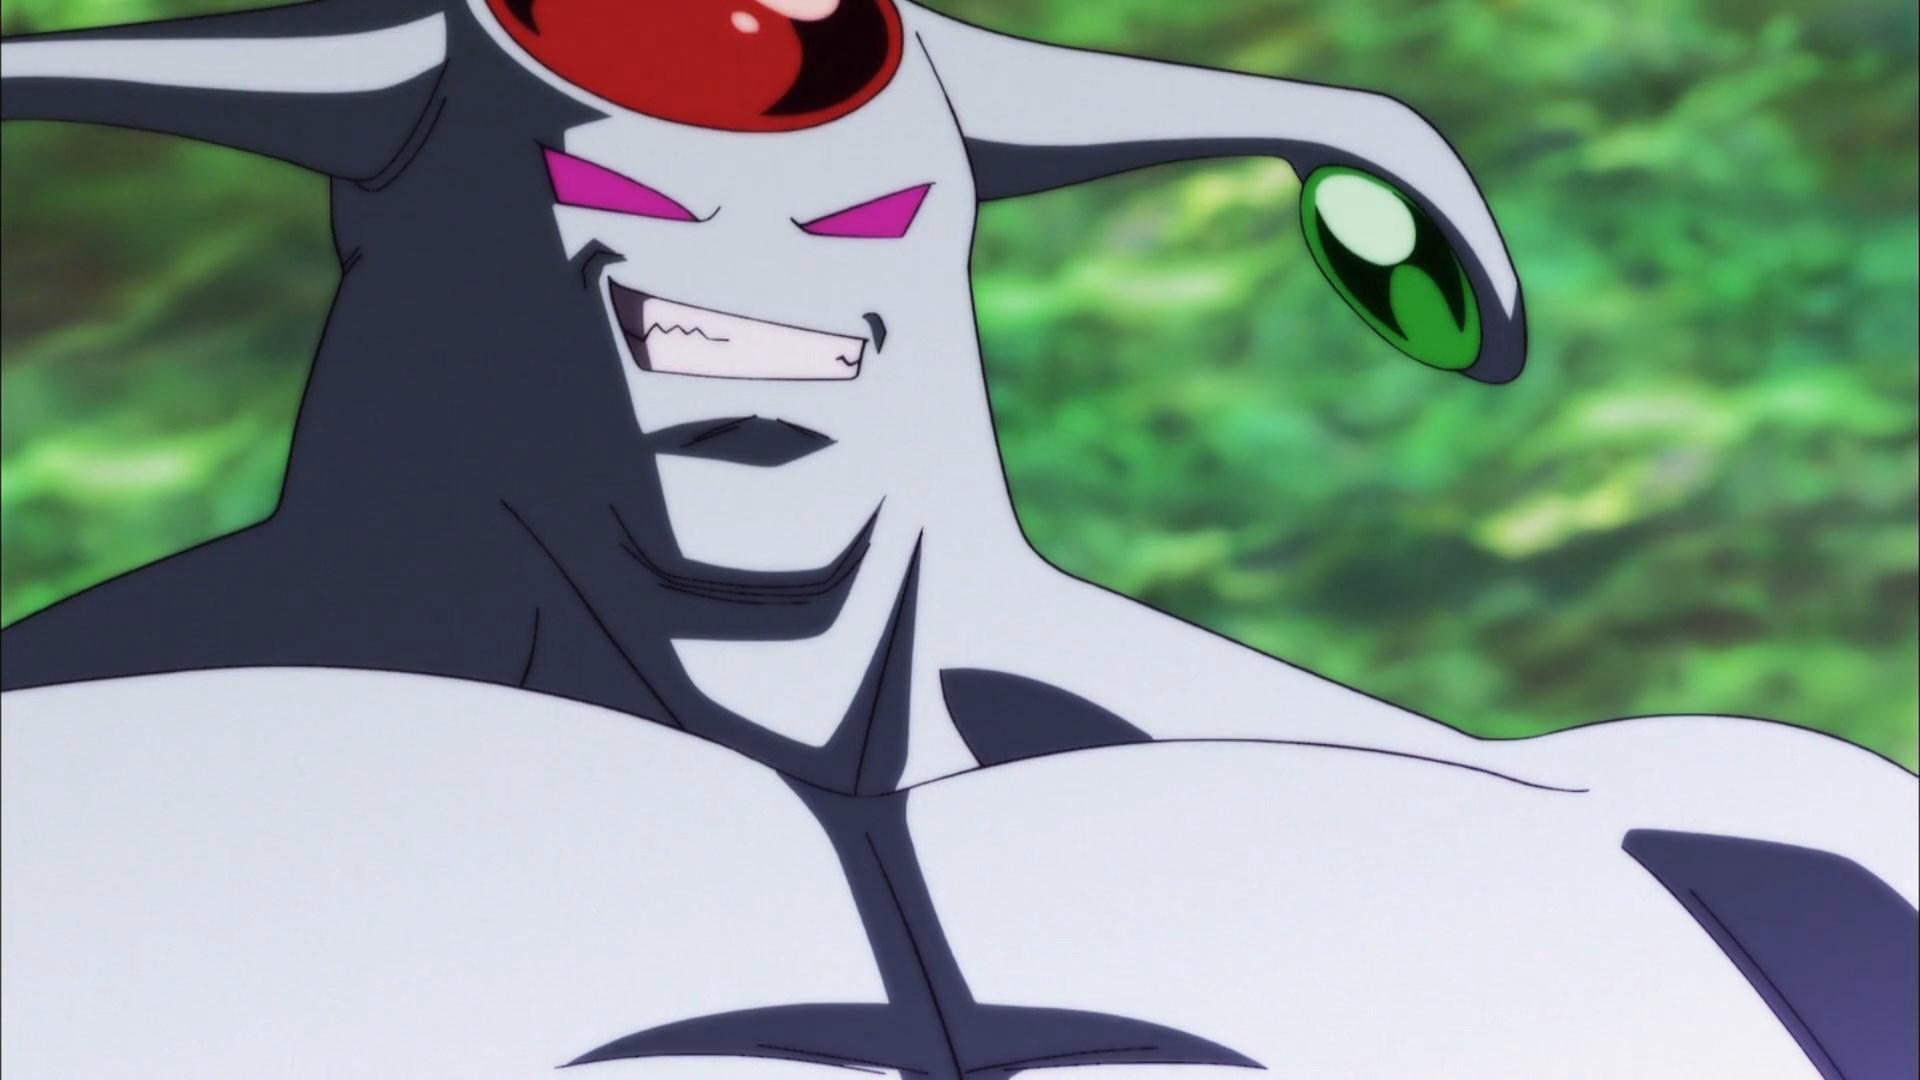 [HorribleSubs] Dragon Ball Super - 121 [1080p].mkv_snapshot_07.10